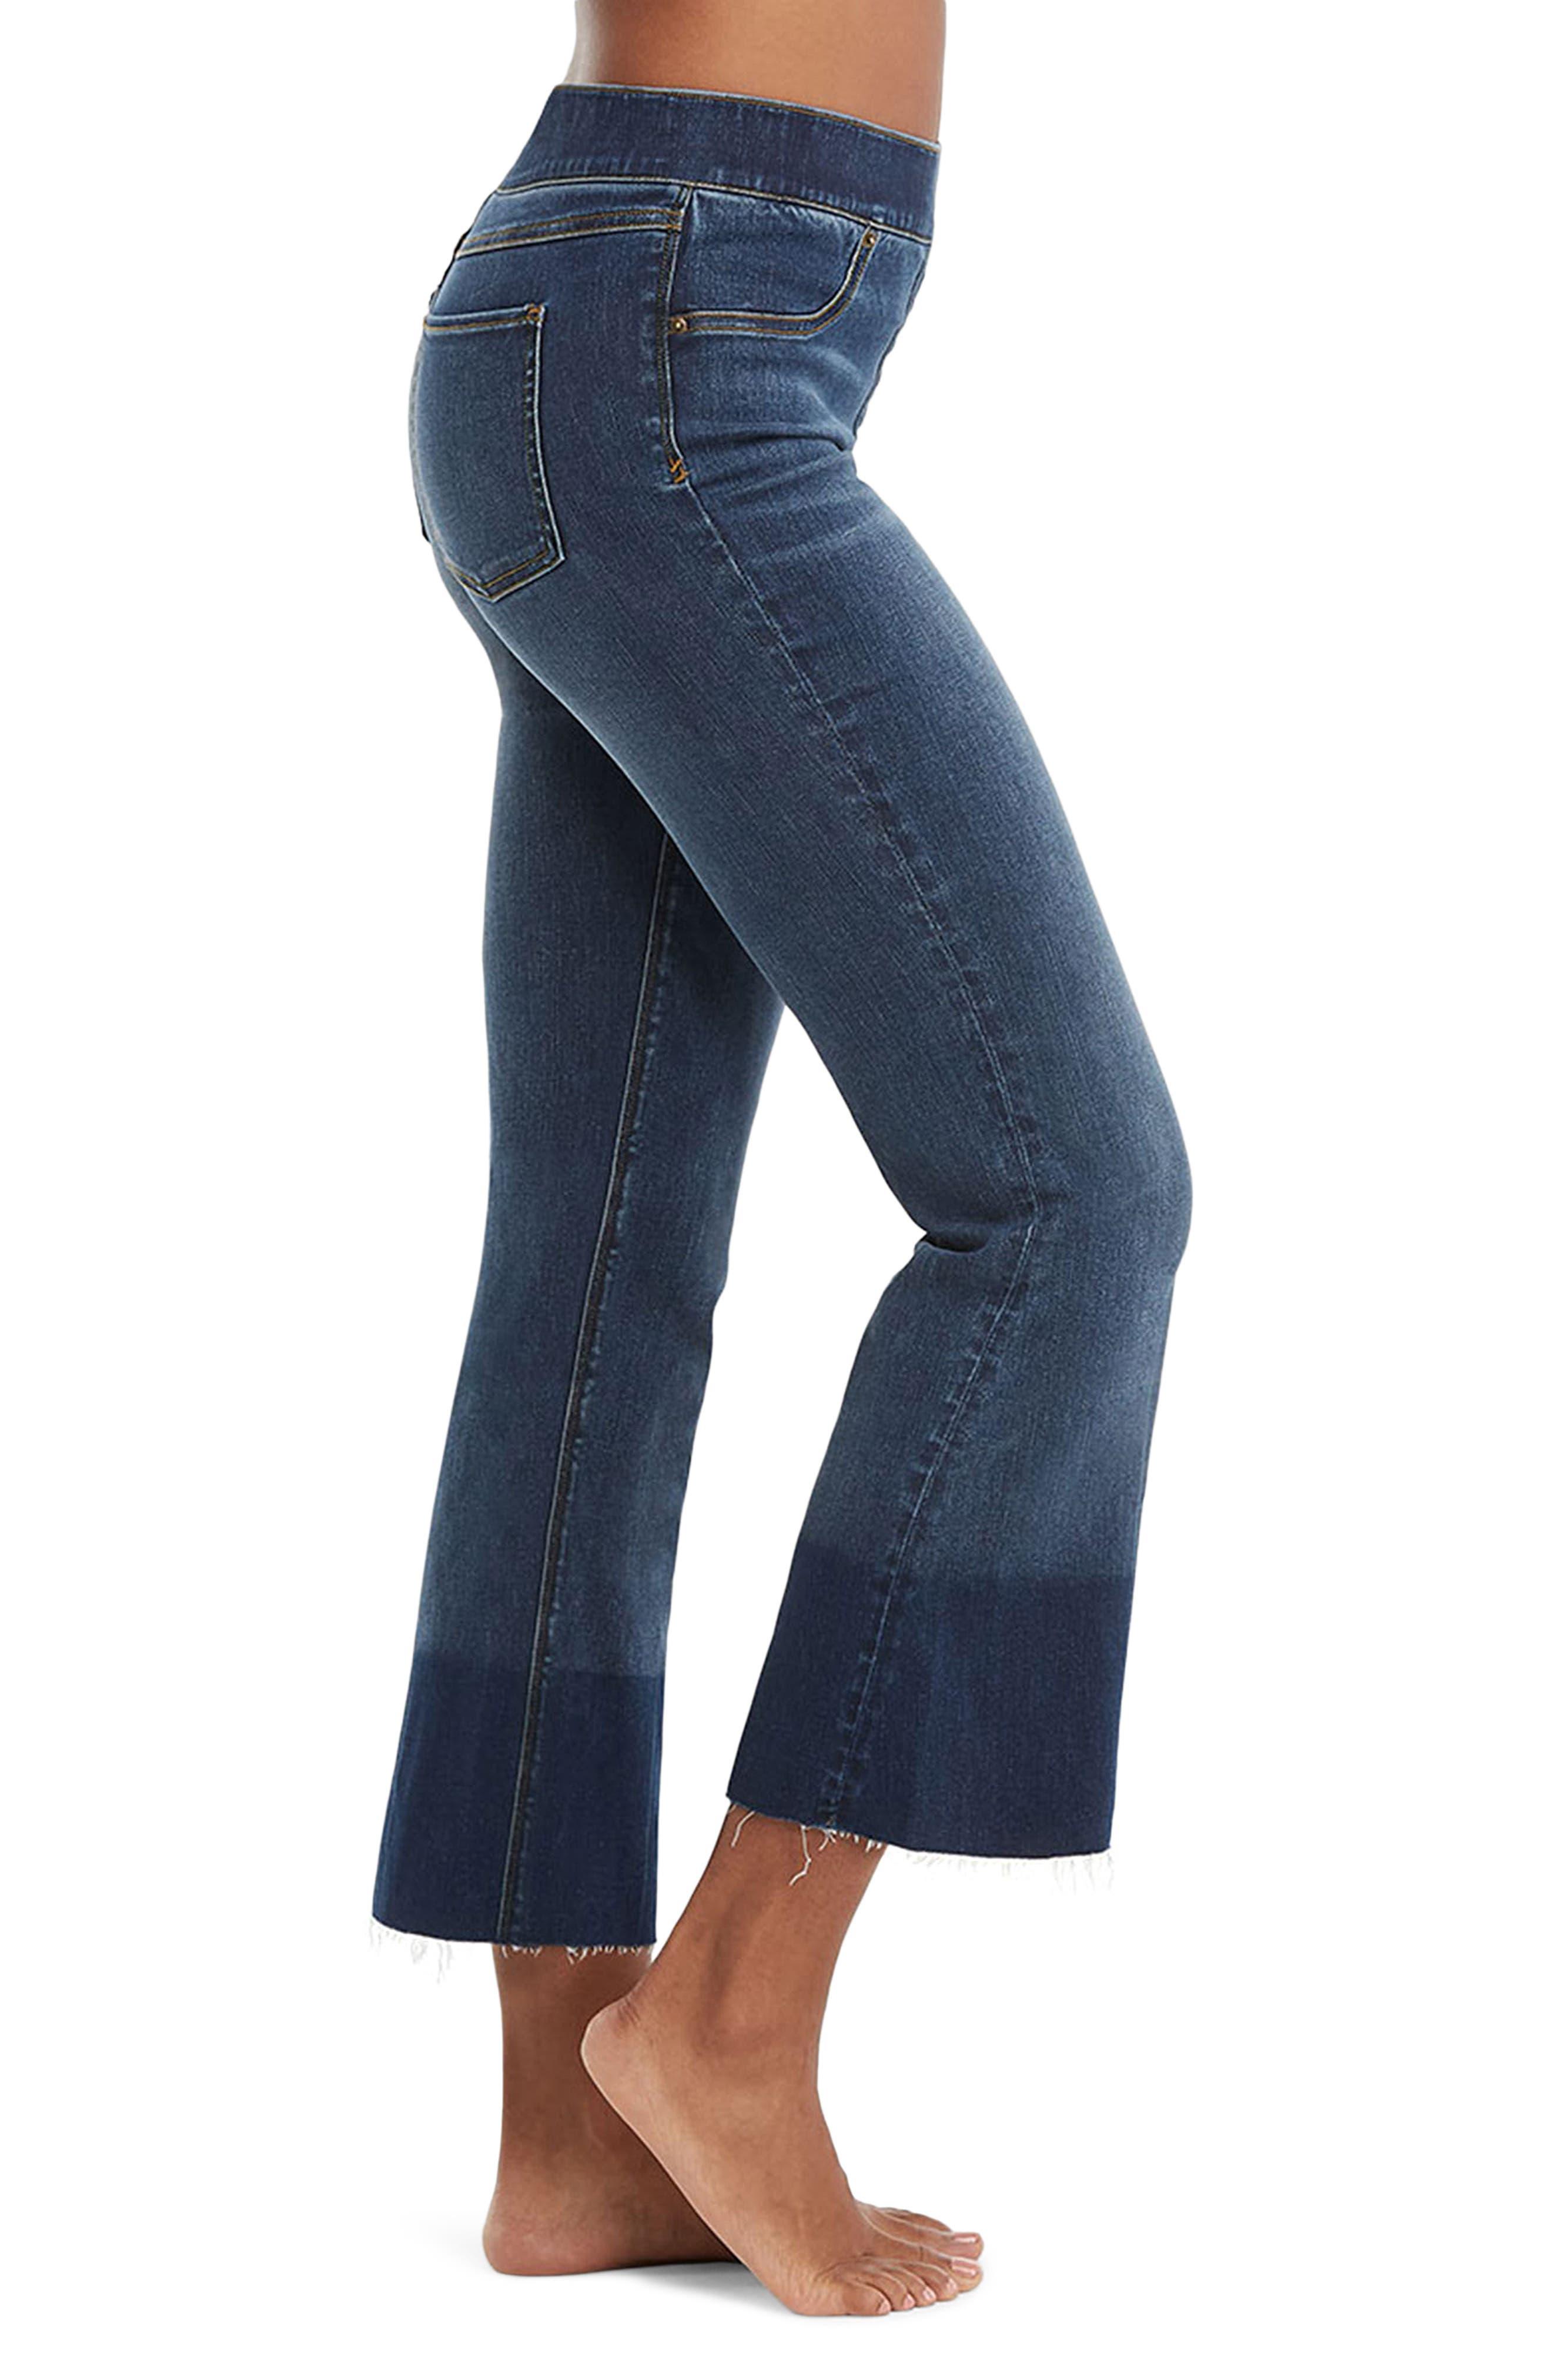 SPANX Crop Flare Raw Hem JEANS Leggings M XL Denim Blue Medium Wash NEW